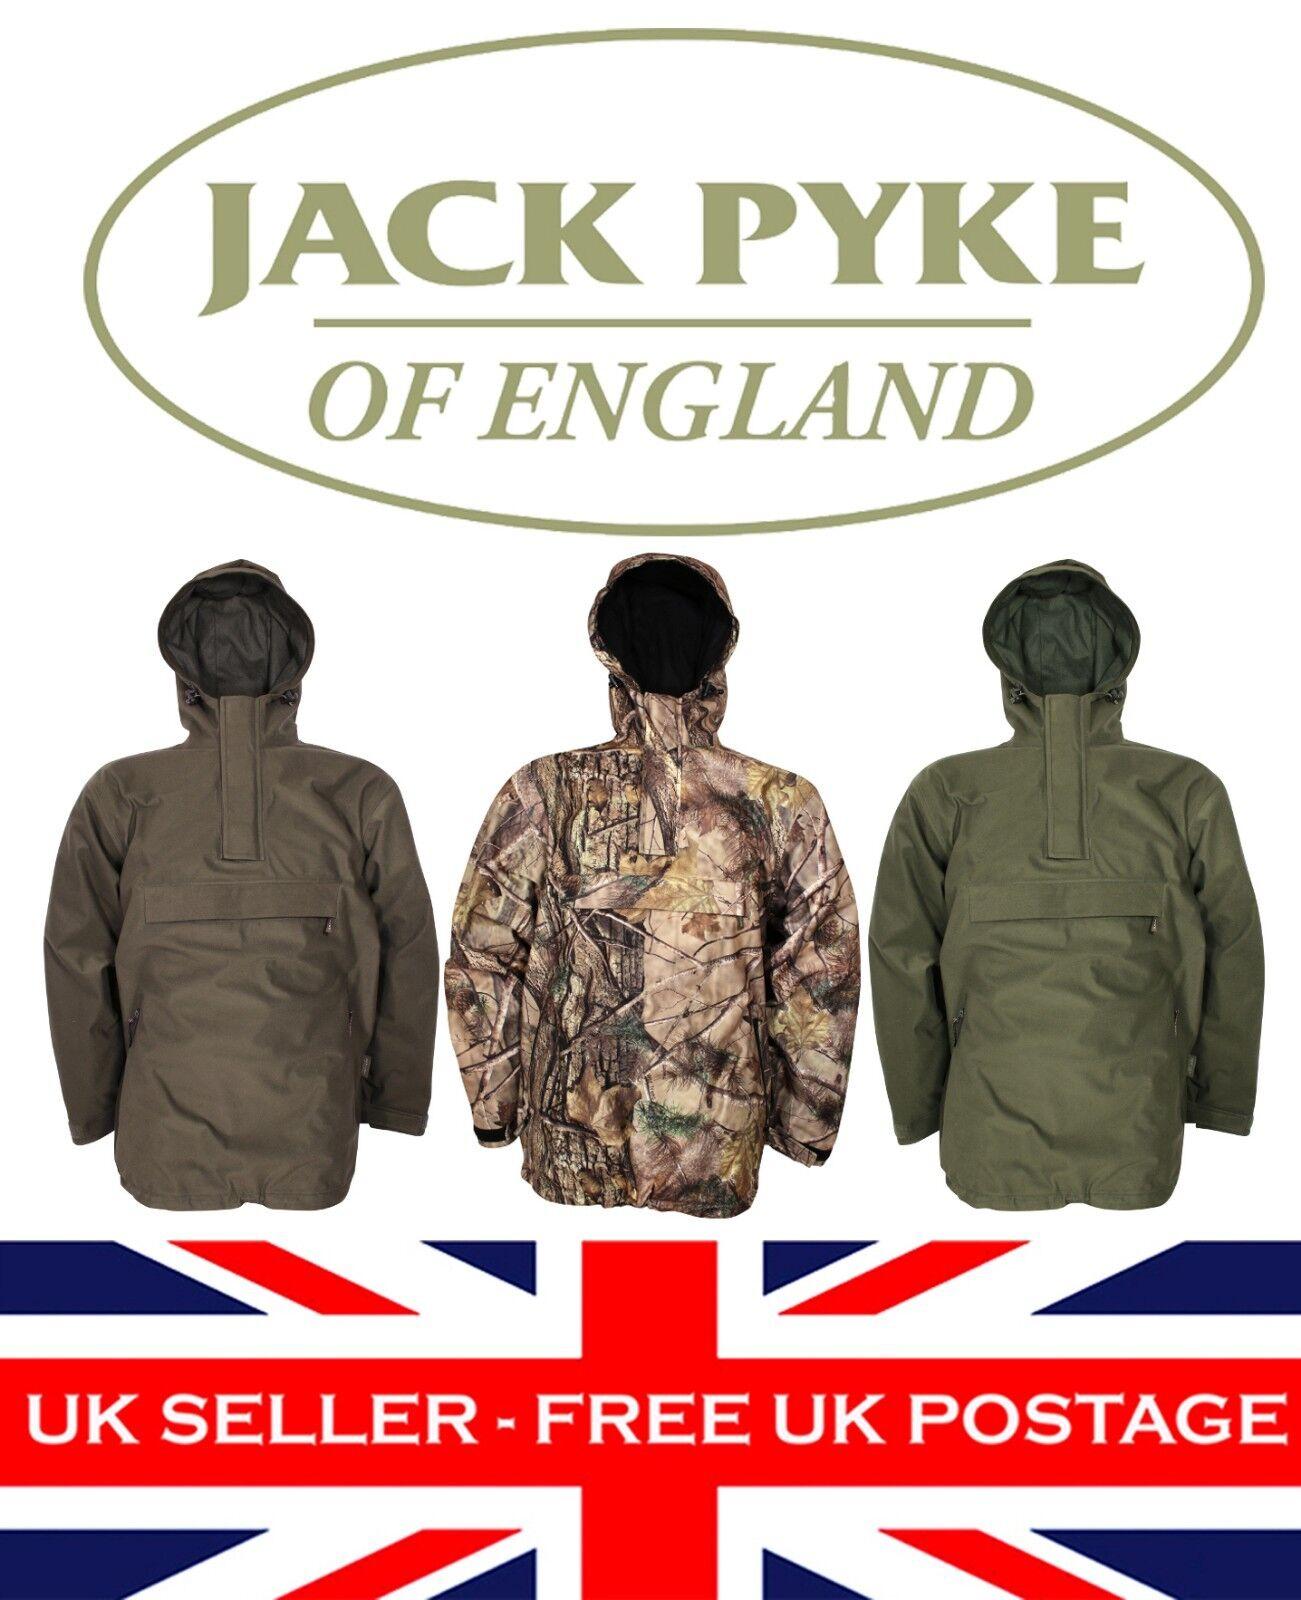 Jack Pyke Galbraith Imperméable Blouse Manteau Chasse Tir Pêche Pêche Pêche Vert Marron 176d05